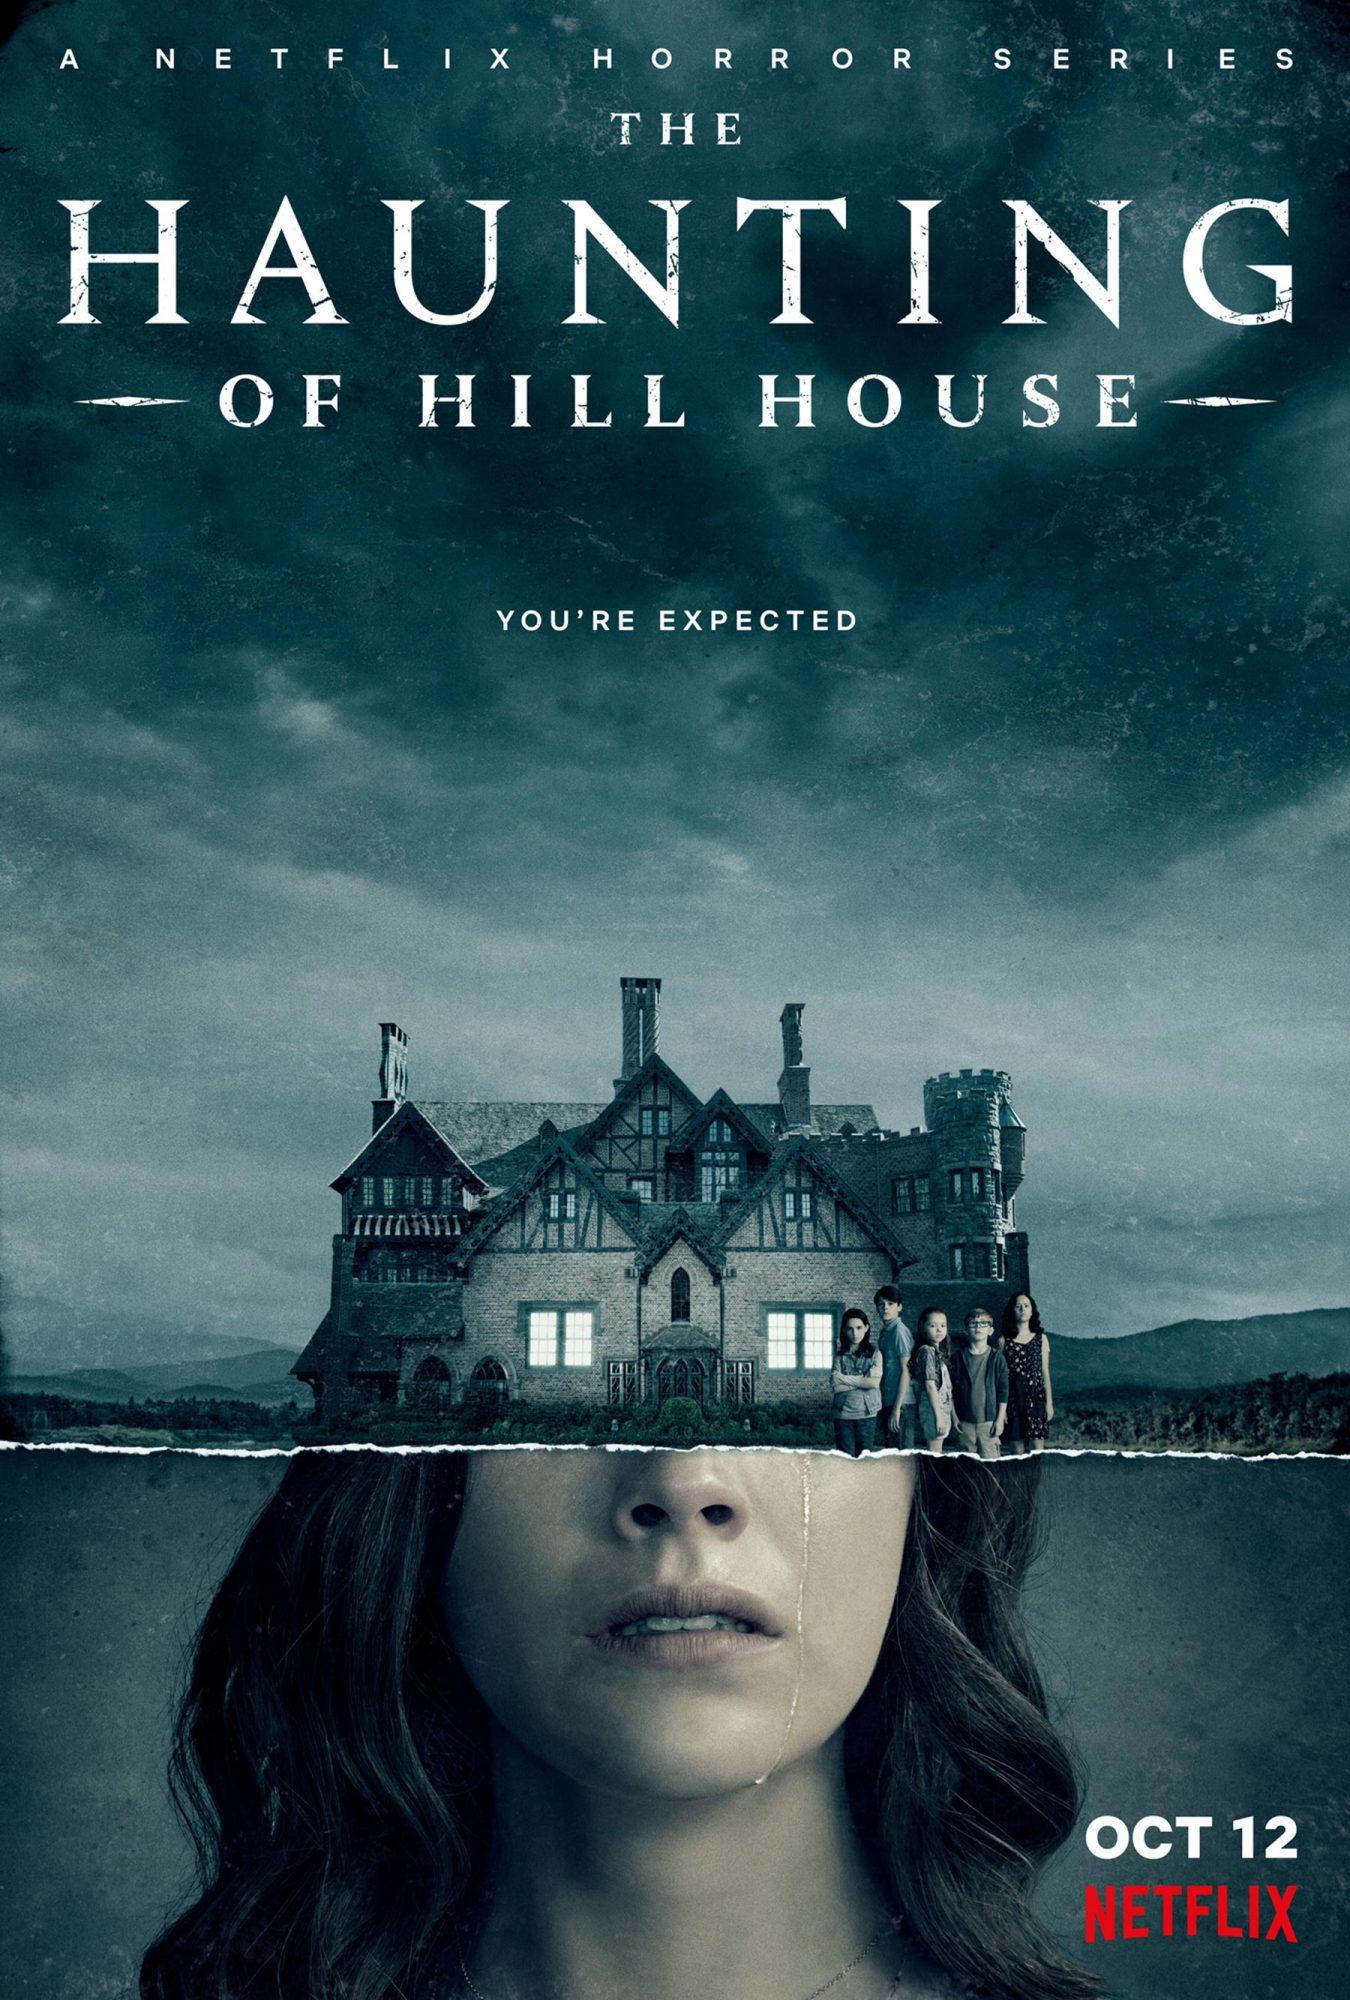 HauntingOfHillHouse_Vertical-Main_PRE_US